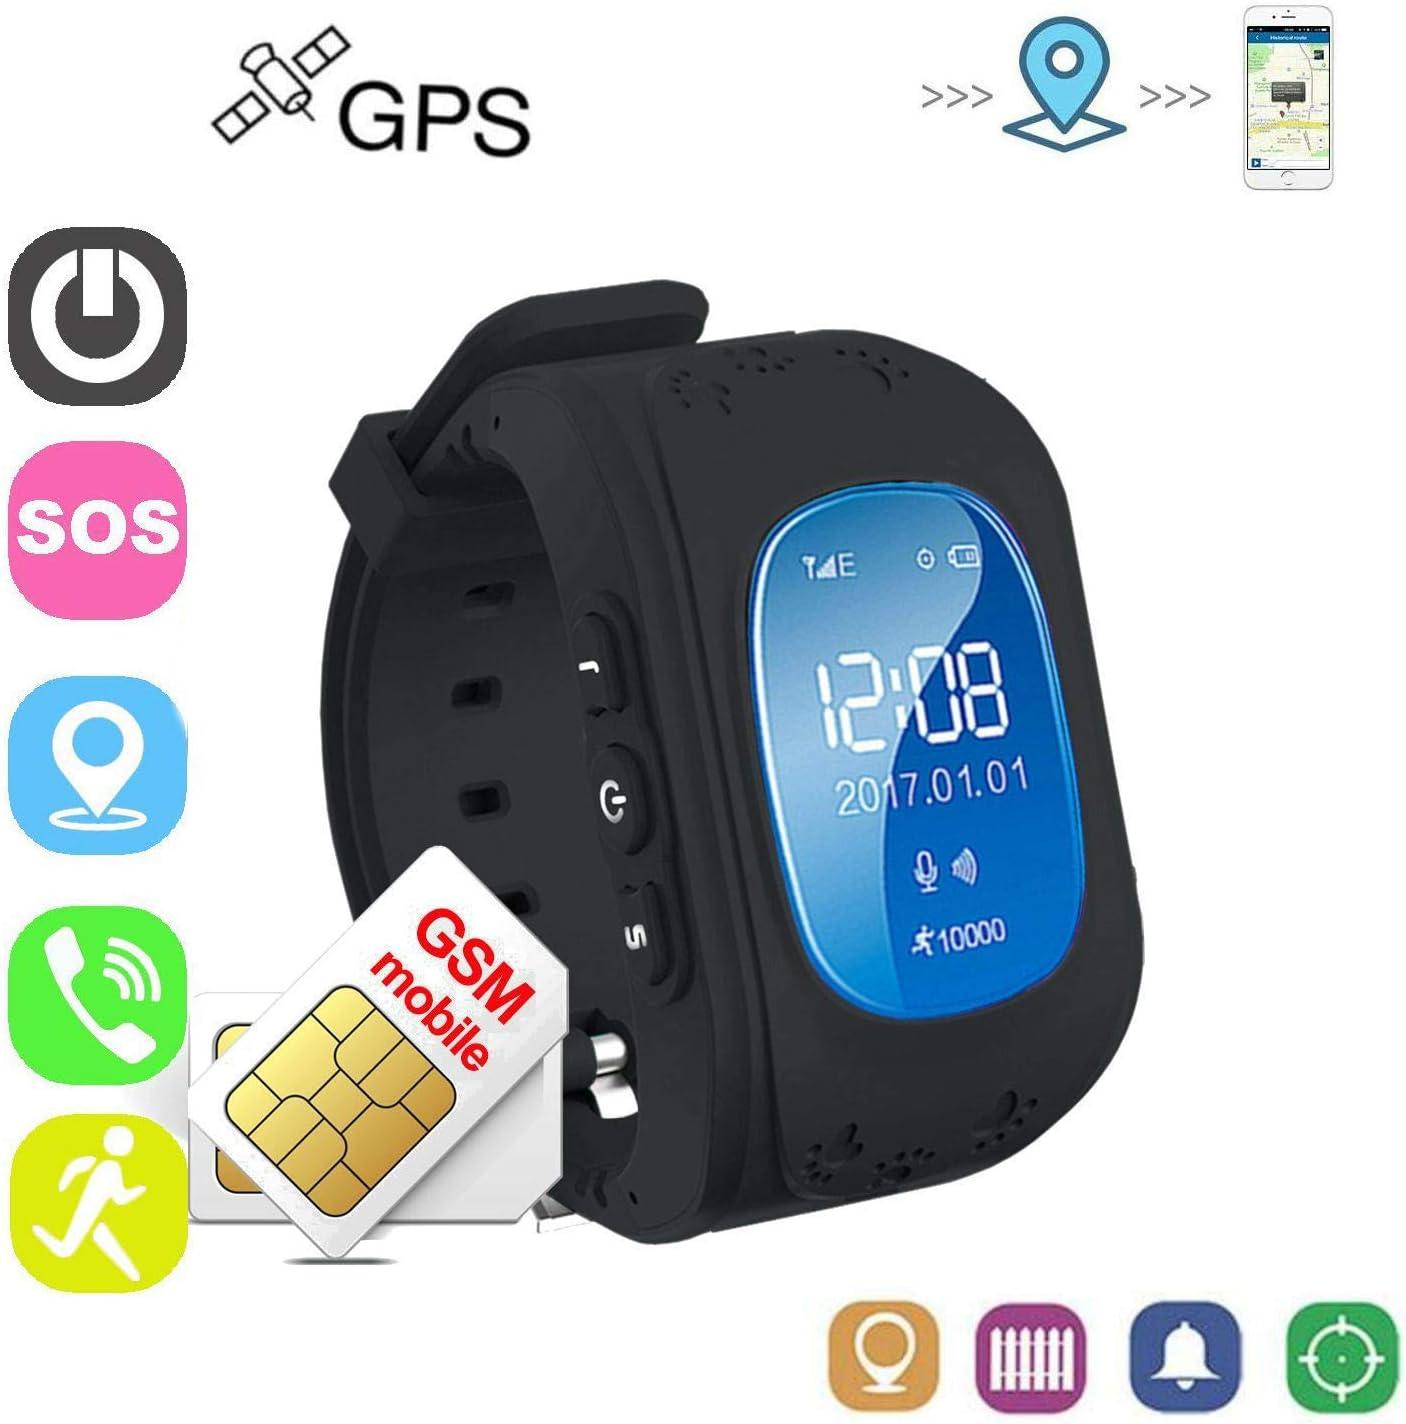 Winnes Reloj Localizador Niños GPS Localizador Niños Pulsera Pulsera Niños Seguridad GPS Reloj Niña GPS Smartwatch Niños Localizador GPS Seguimiento en Tiempo Real,Podómetro (Nergo)